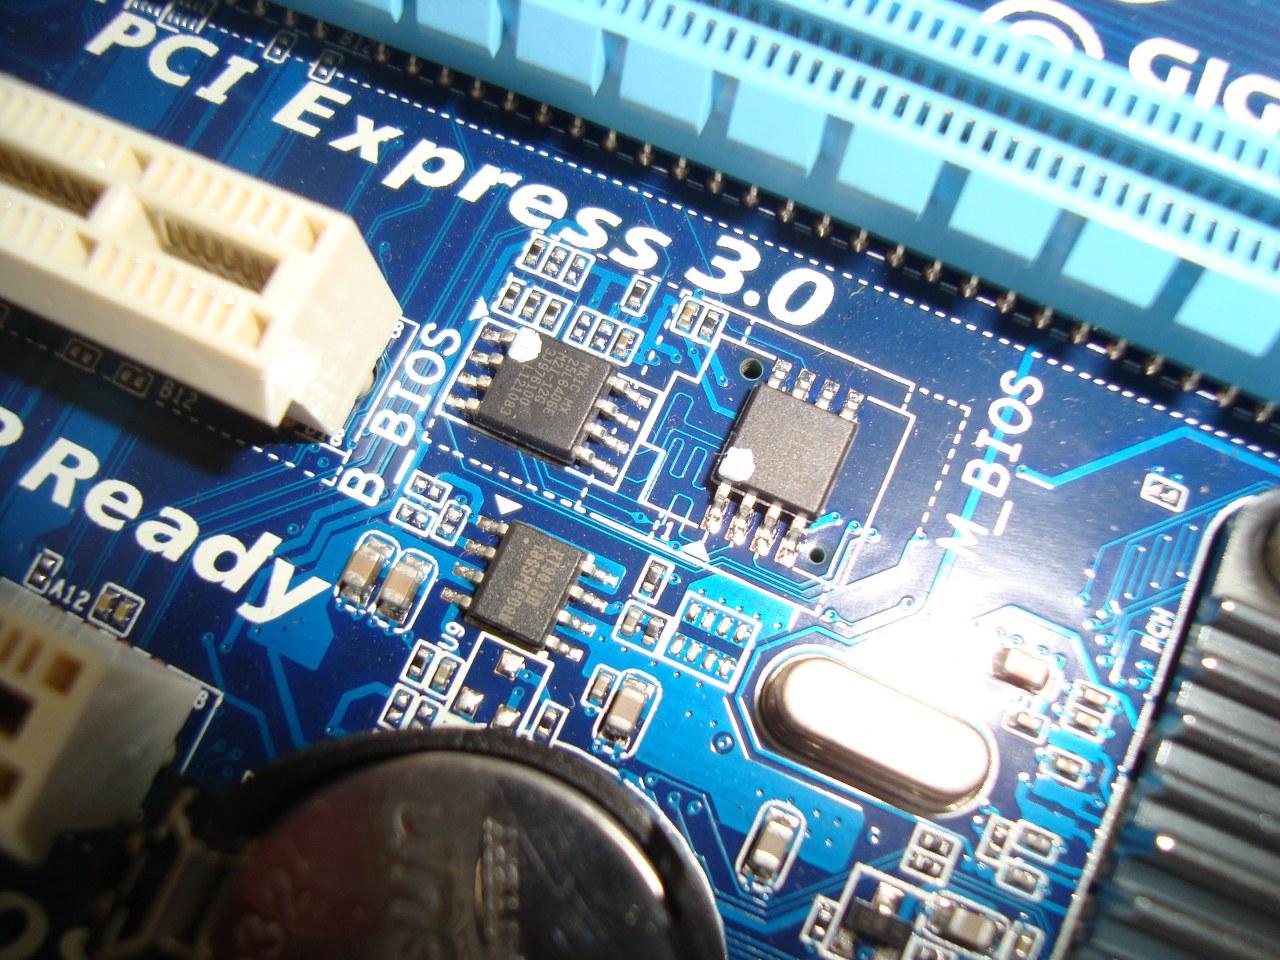 bateria CMOS, Gigabyte B75M-D3V